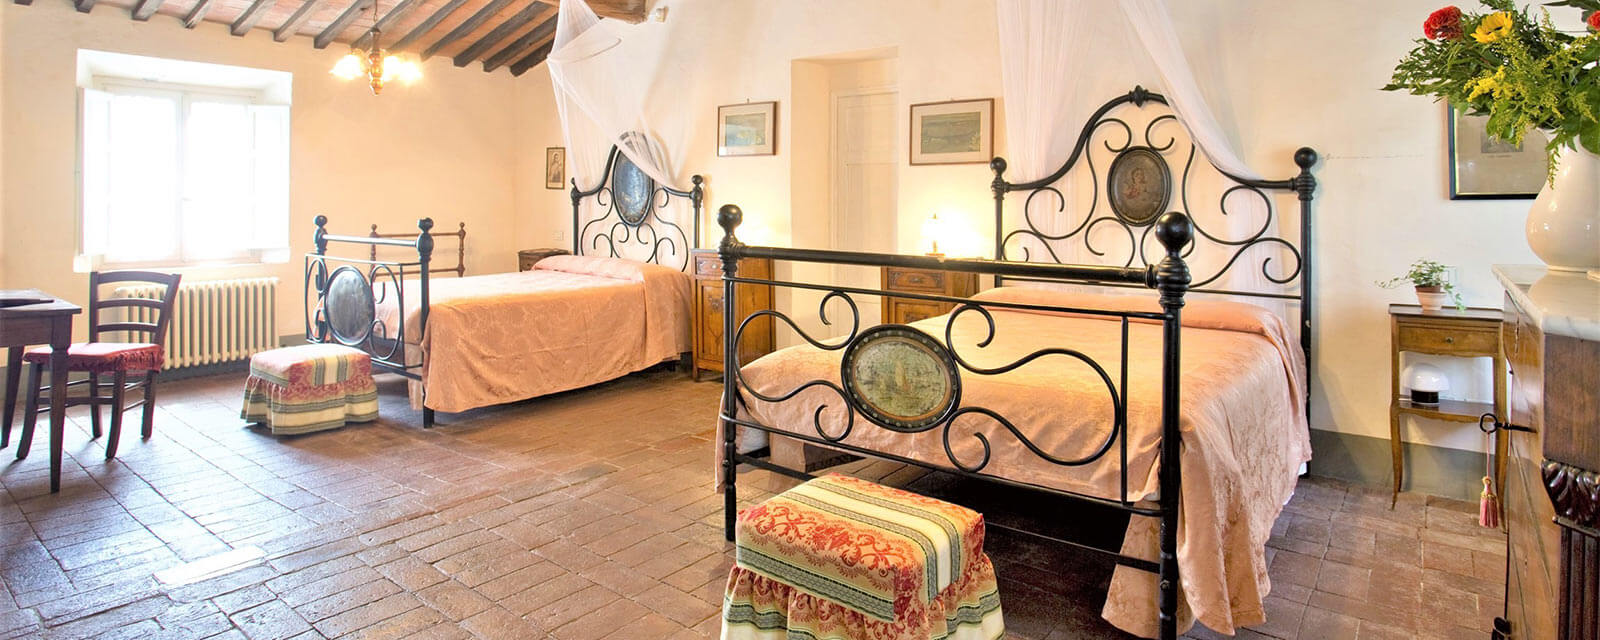 VILLA ROSALIA | Ferienhaus in der Toskana bei Guamo | Hier ...